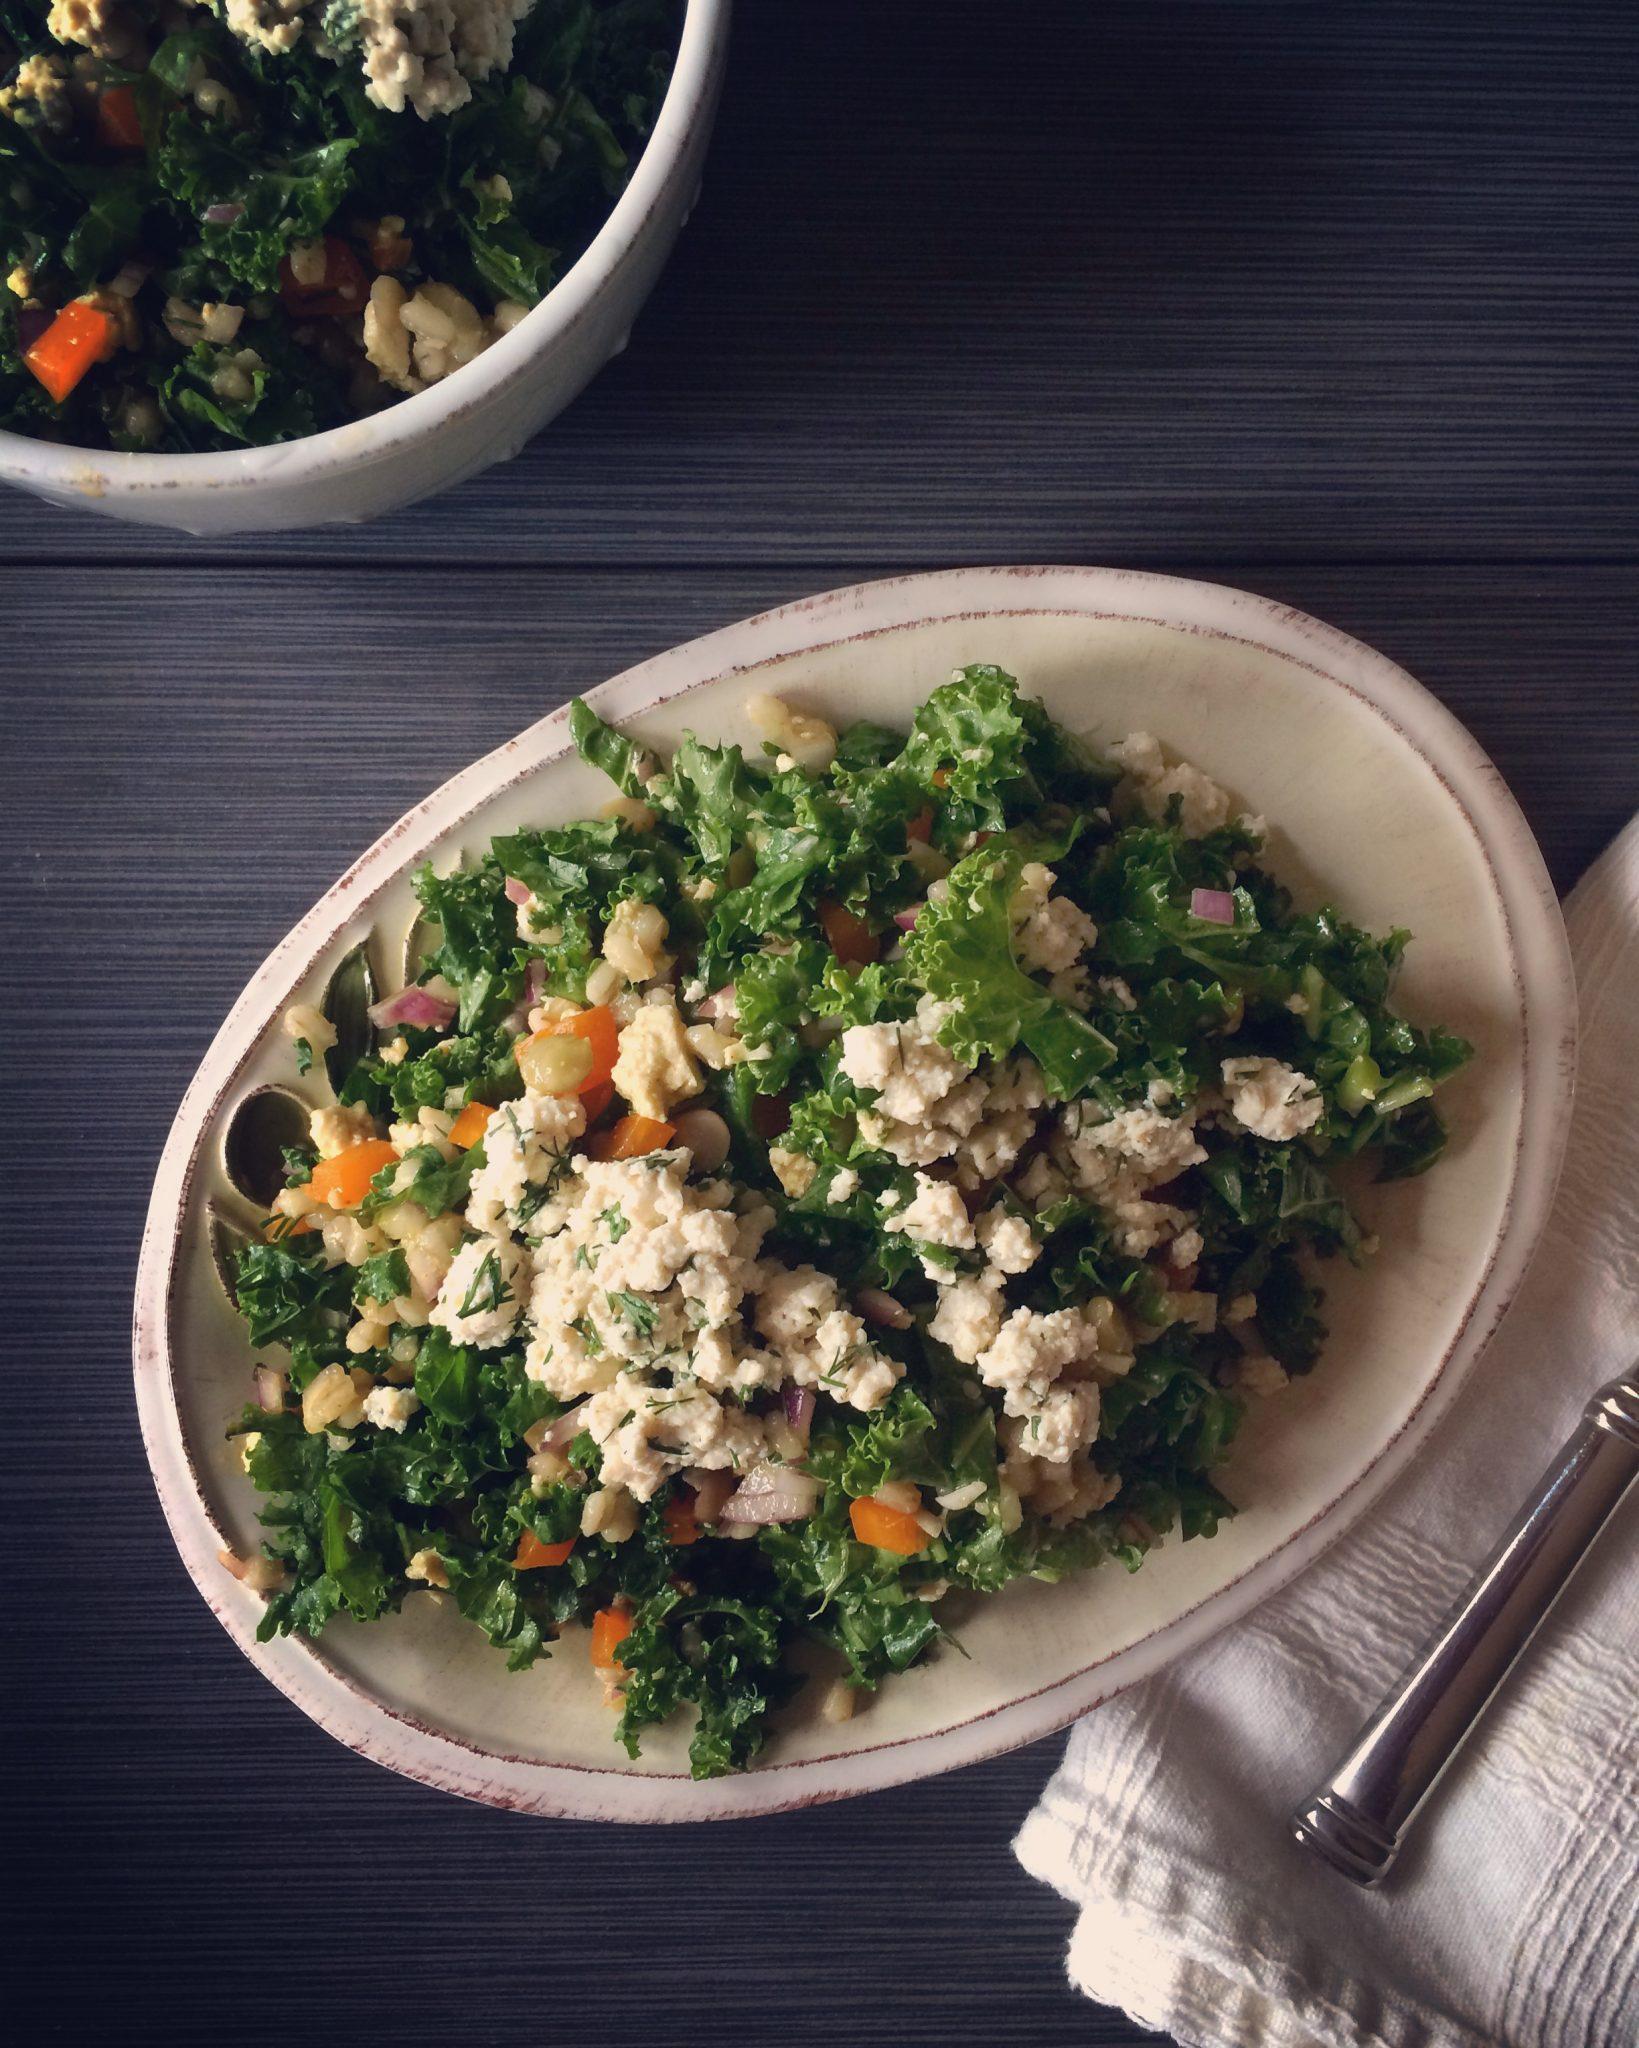 Barley + Greens Salad with Grapefruit Vinaigrette